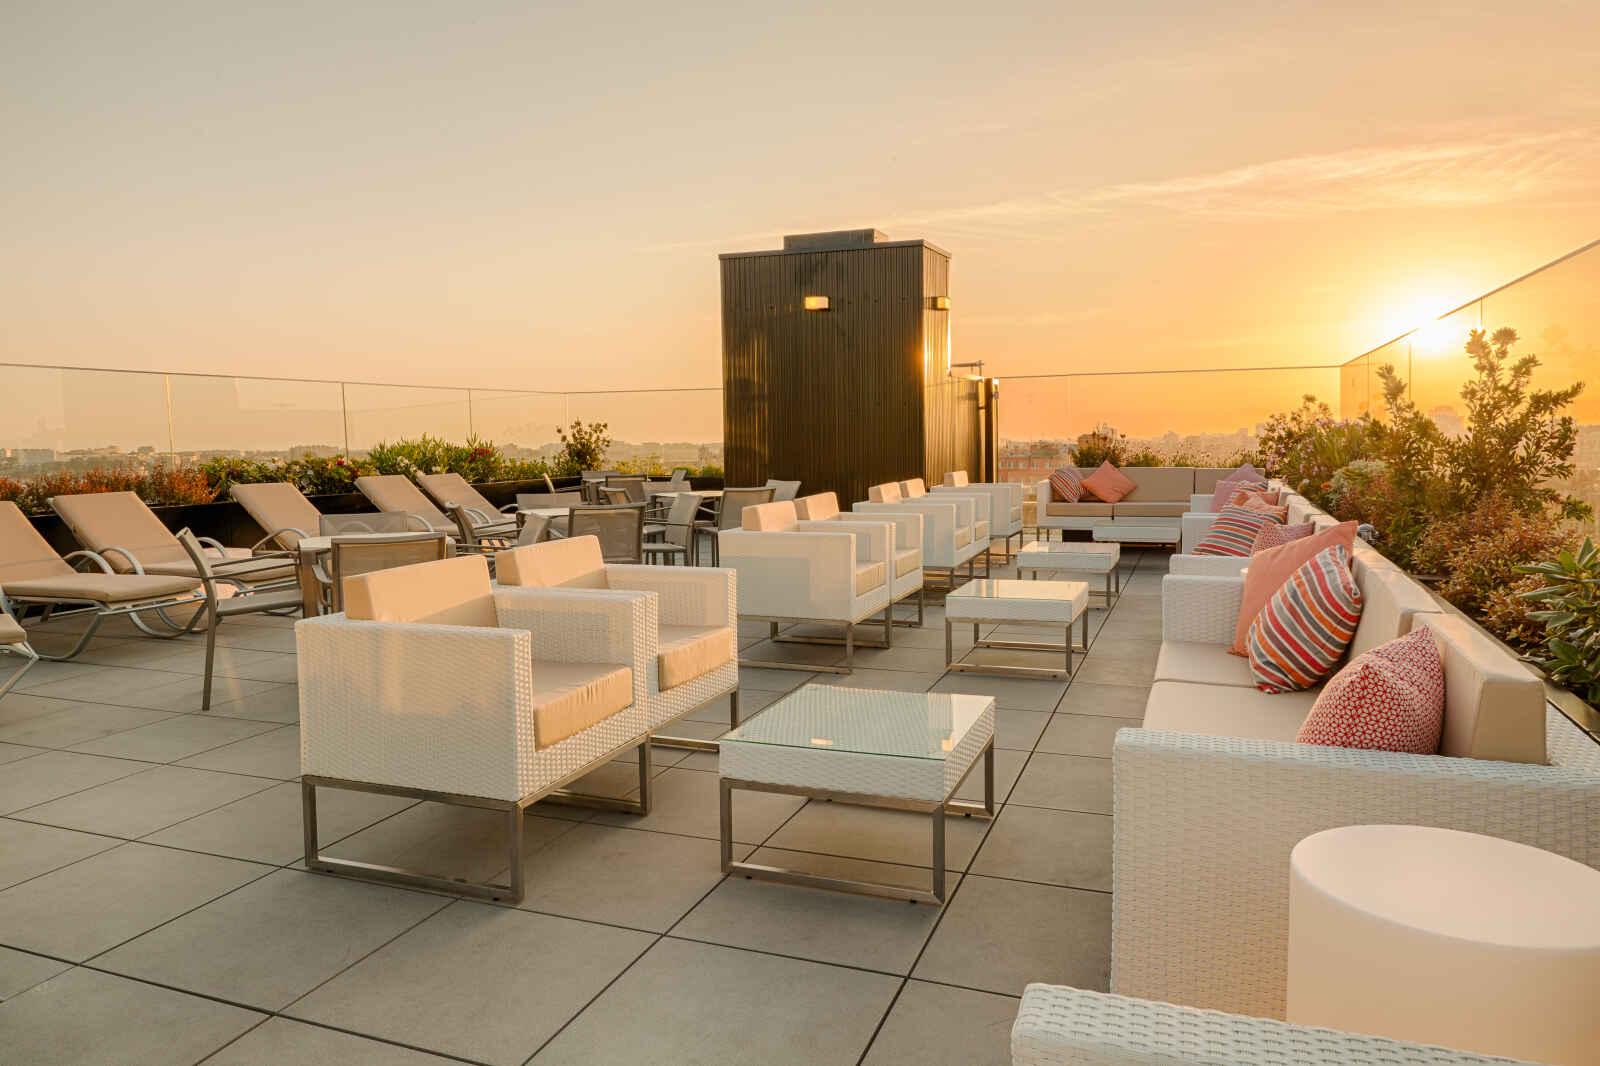 Séjour Nord Portugal - Premium Porto Downtown Hotel - 4*